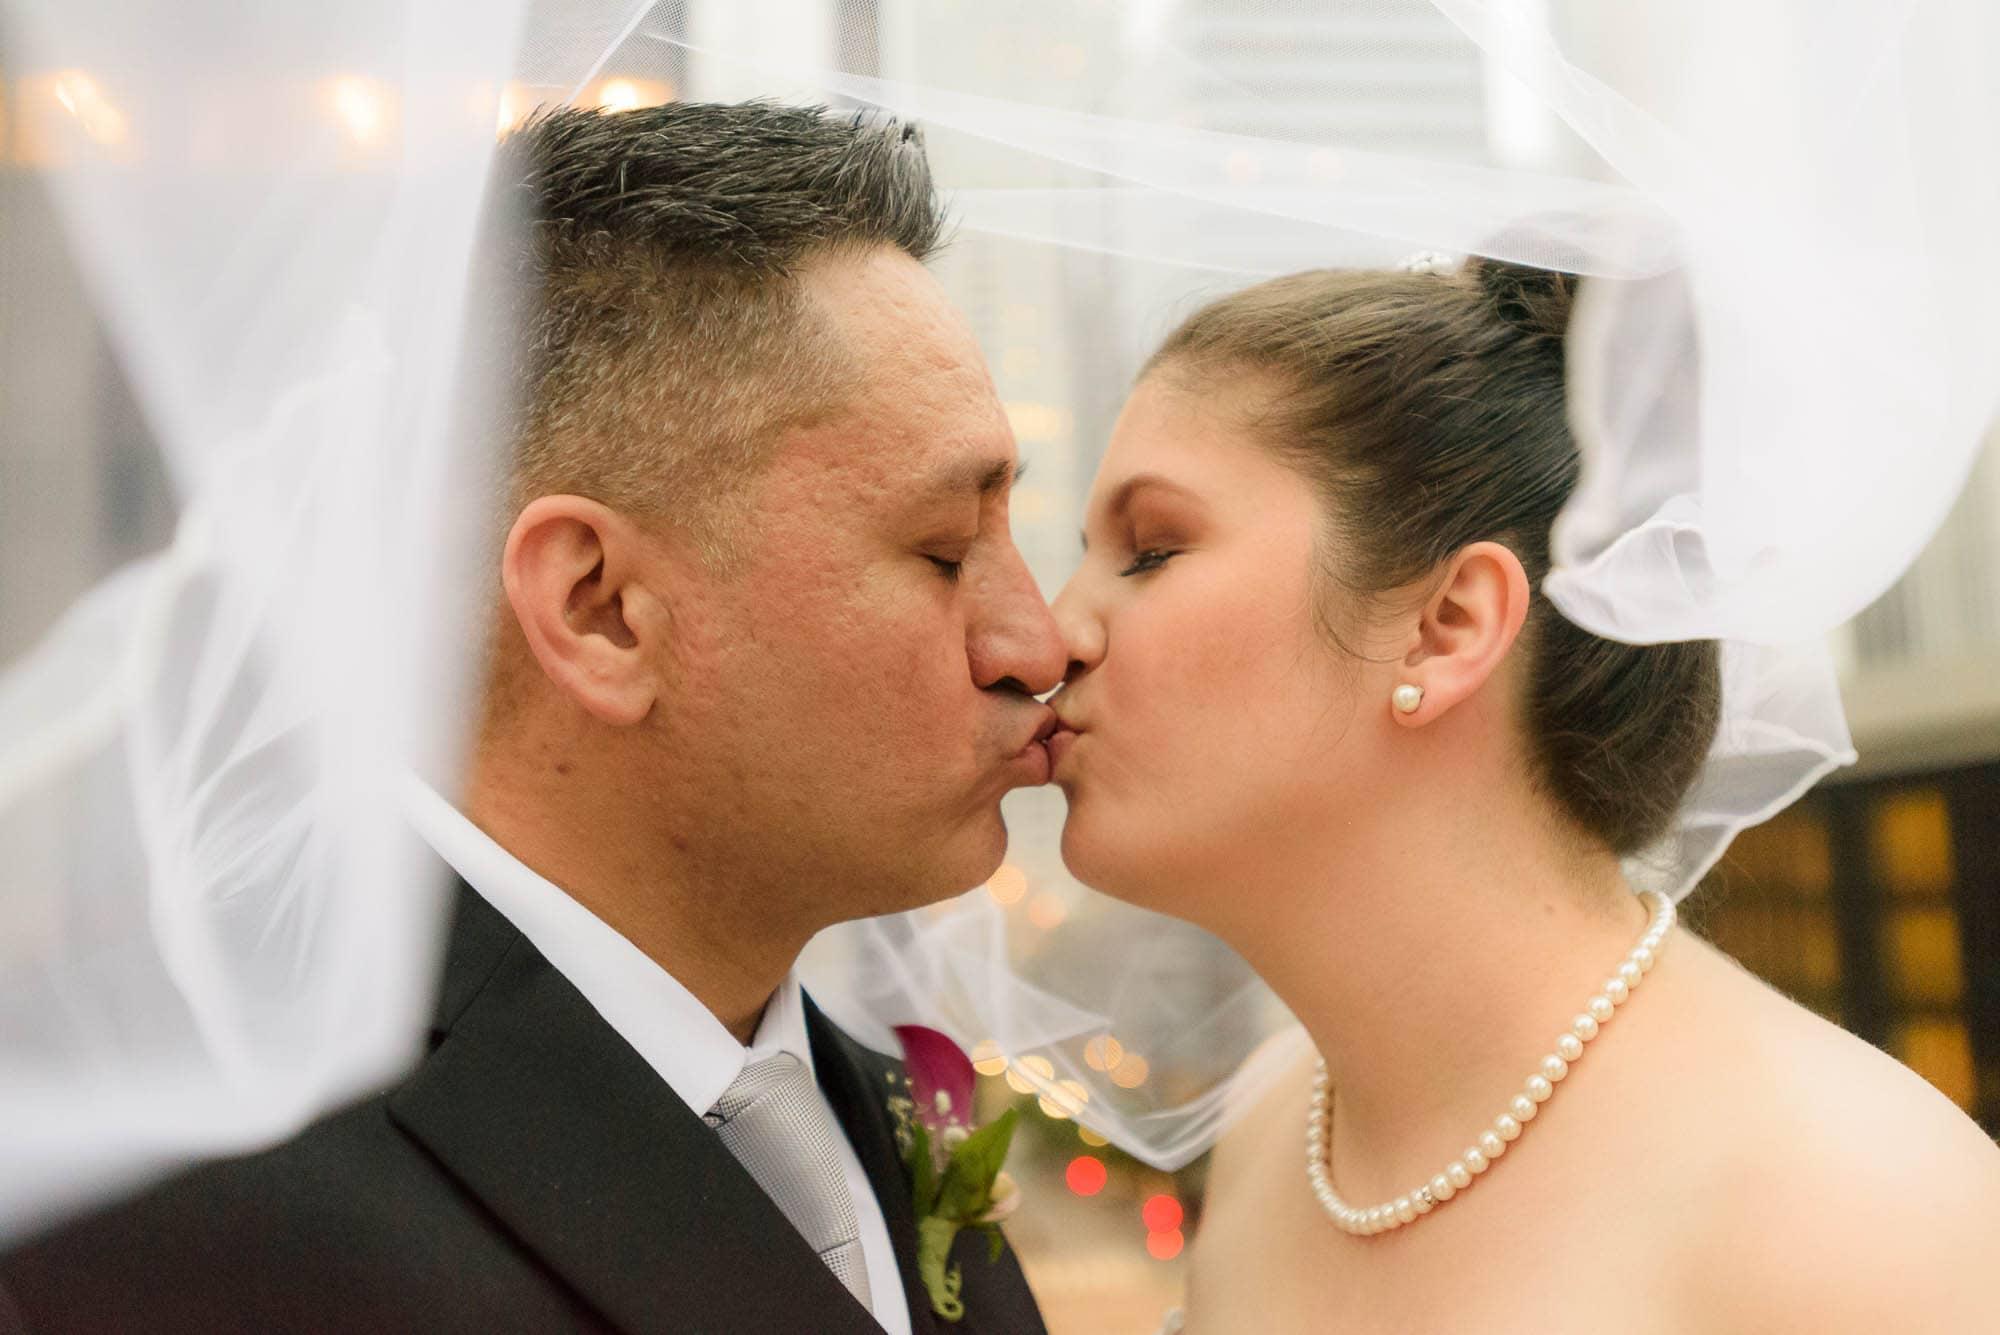 026_Alan_and_Heidi_Wedding_Nicole_Roman